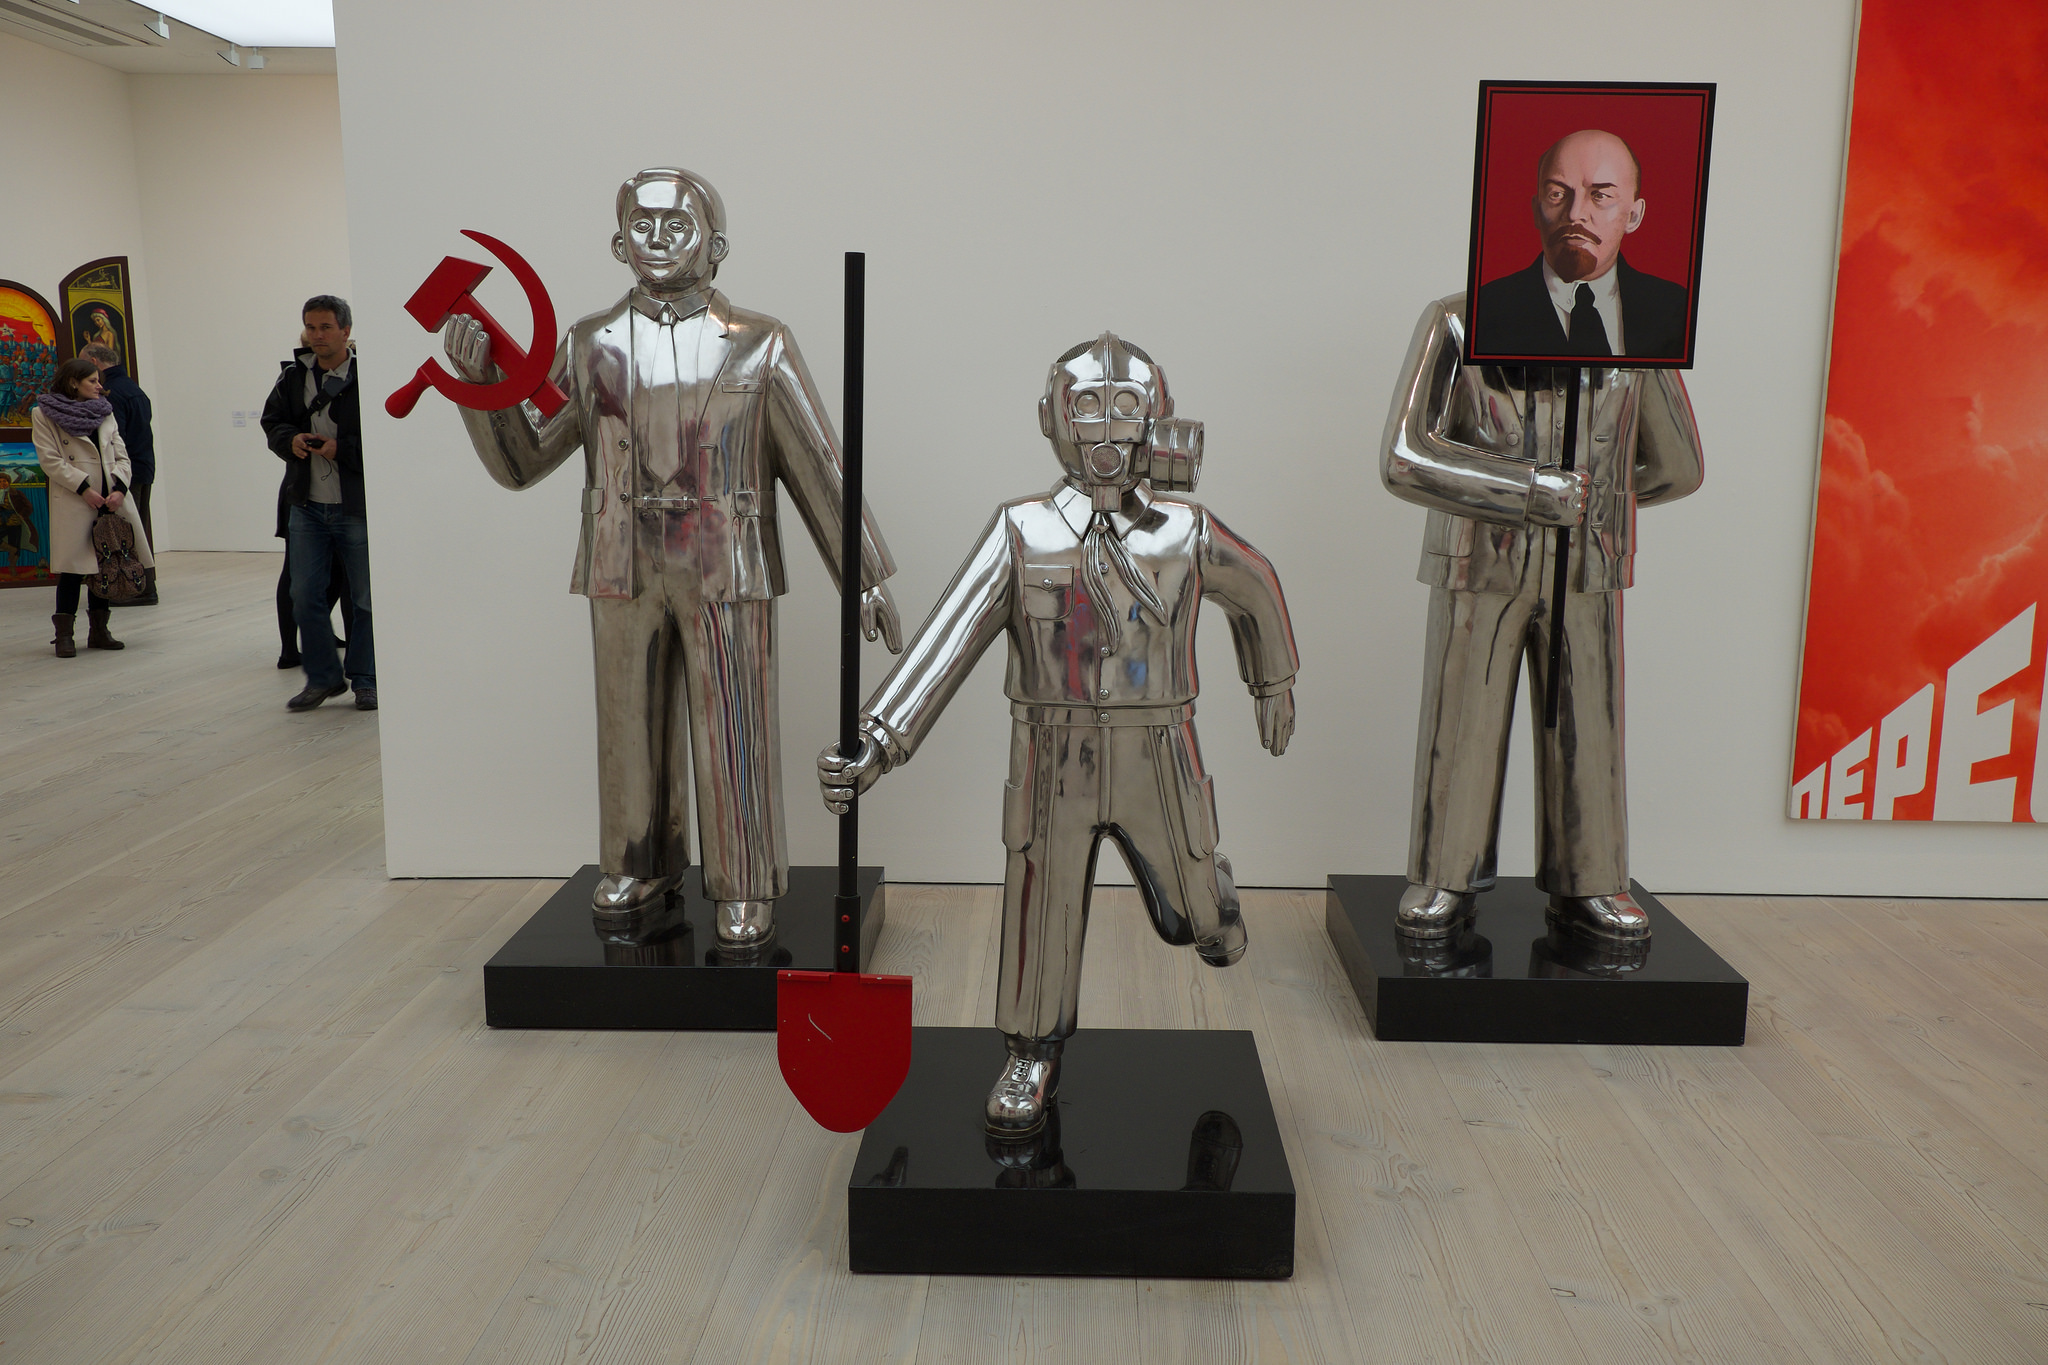 Галерея Саатчи, экспонаты